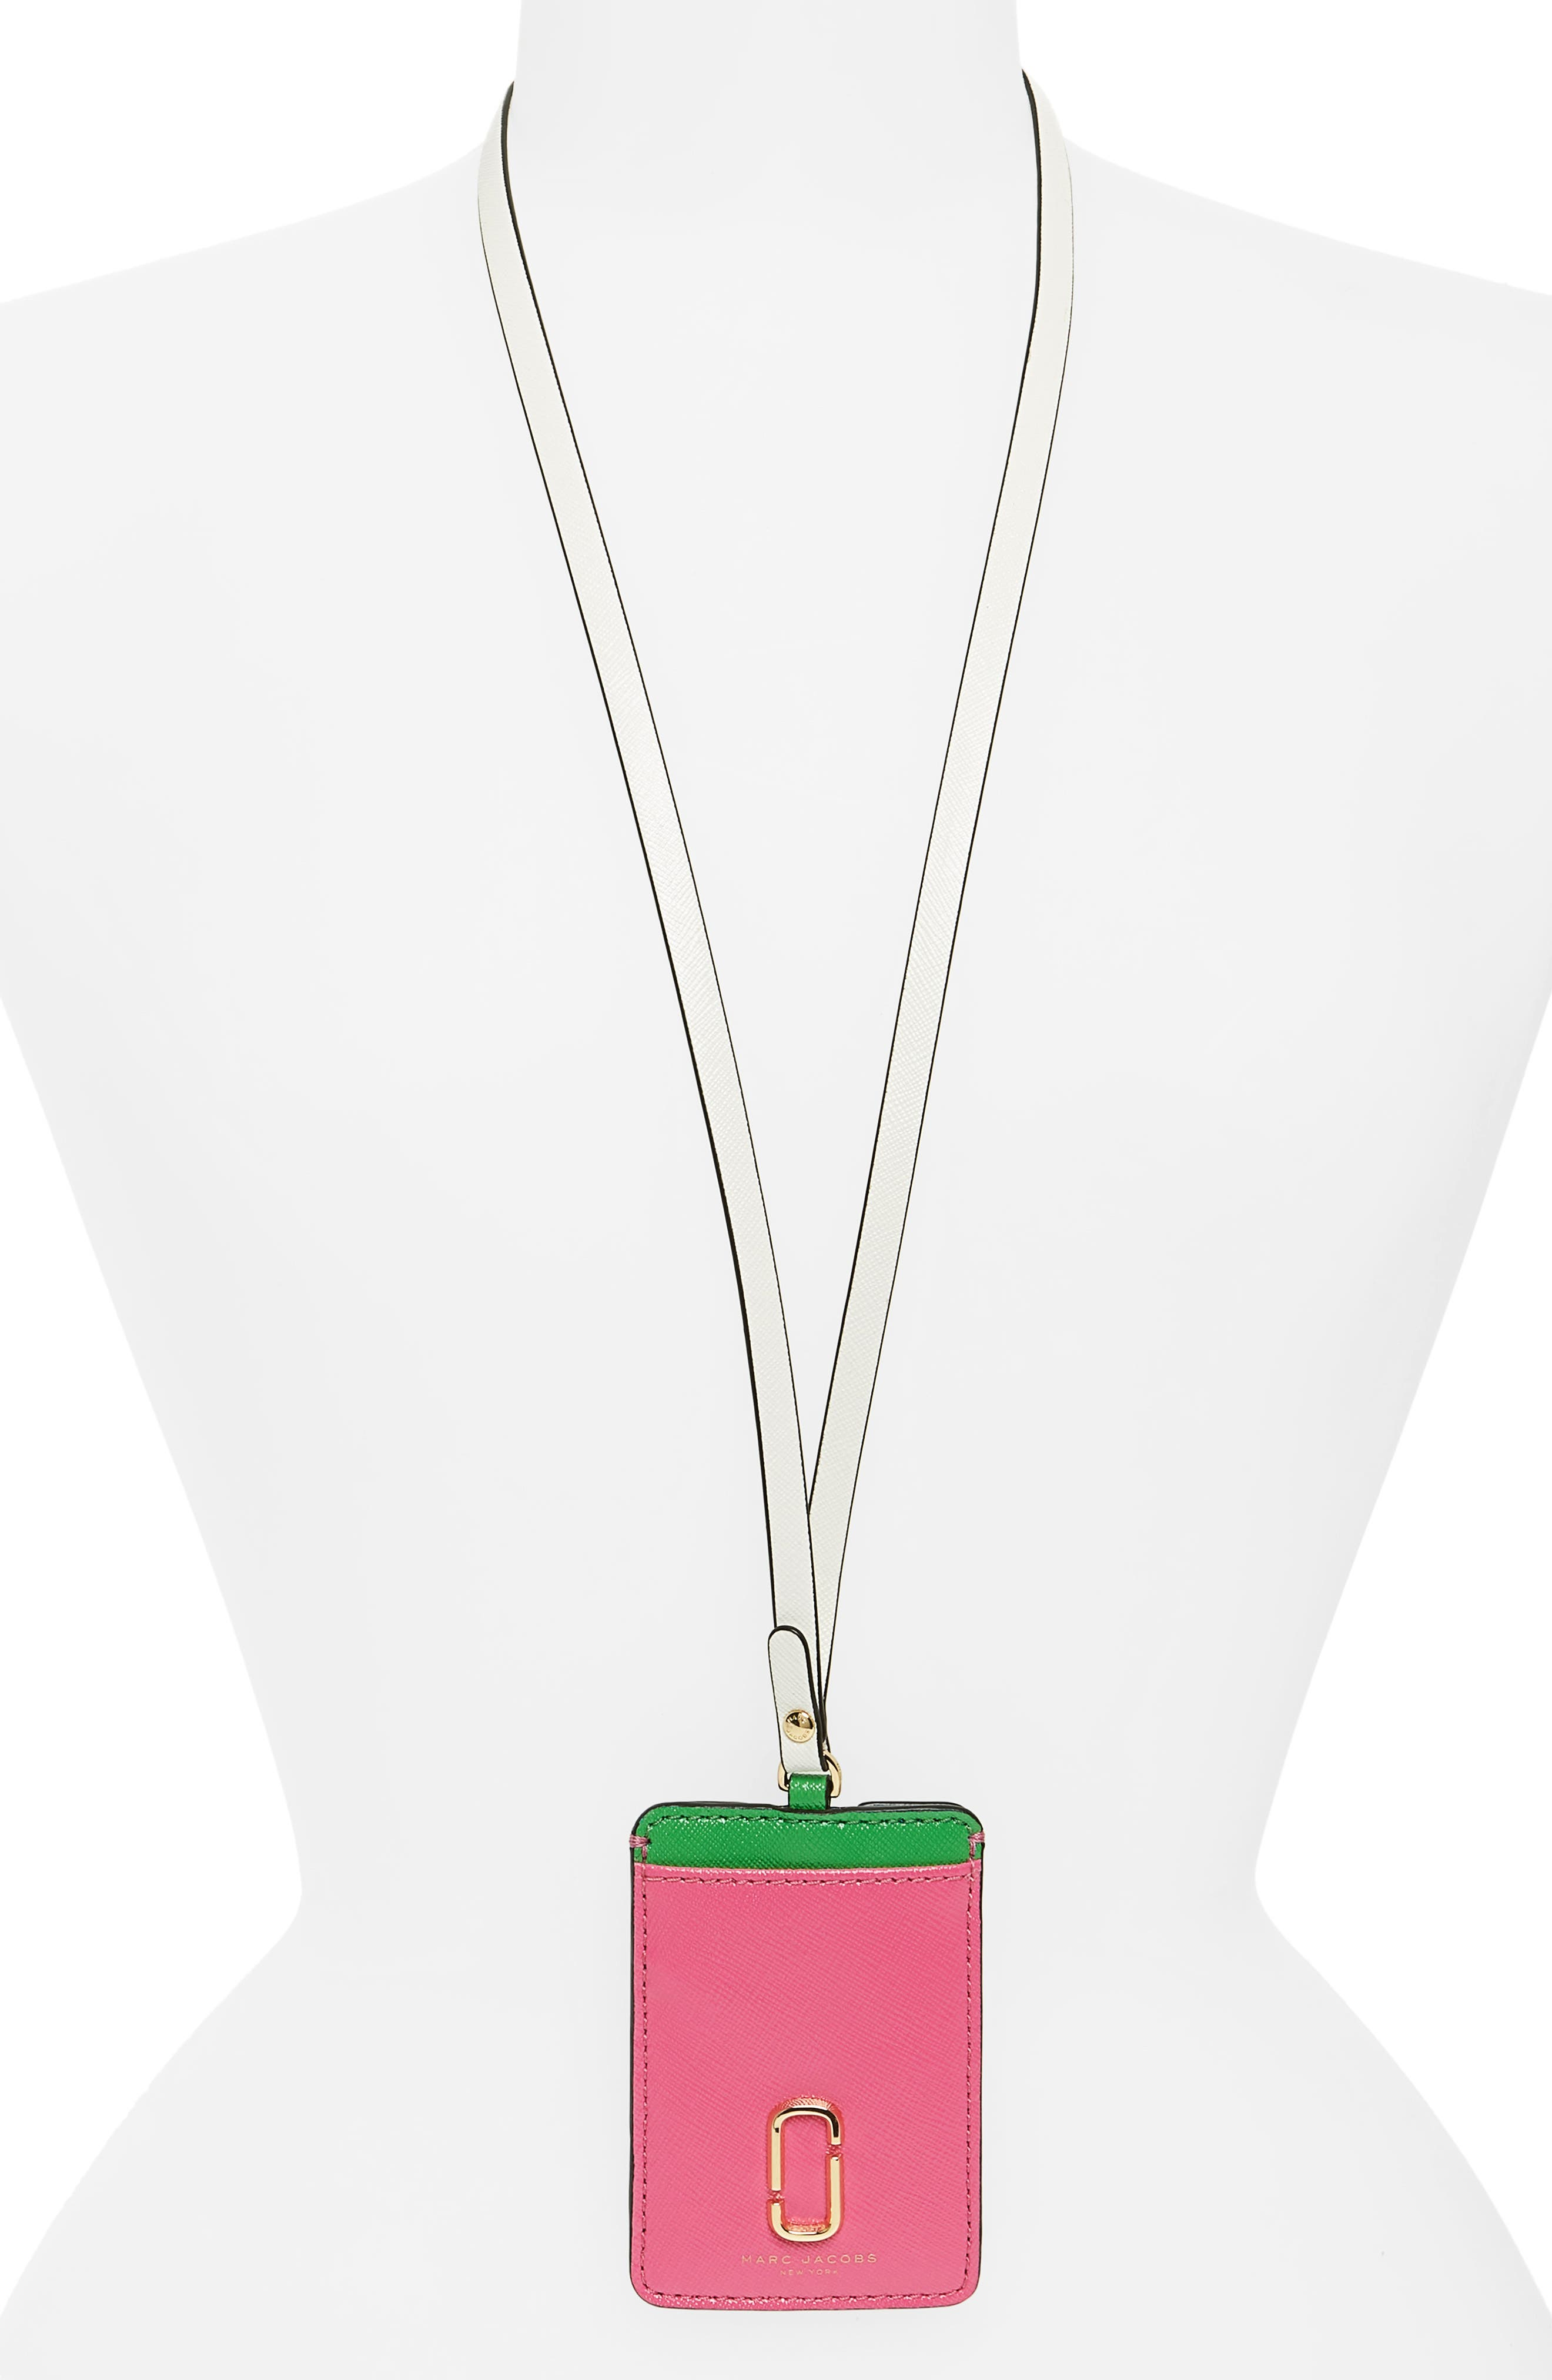 Snapshot Long Strap Leather Commuter Card Case,                         Main,                         color, Vivid Pink Multi